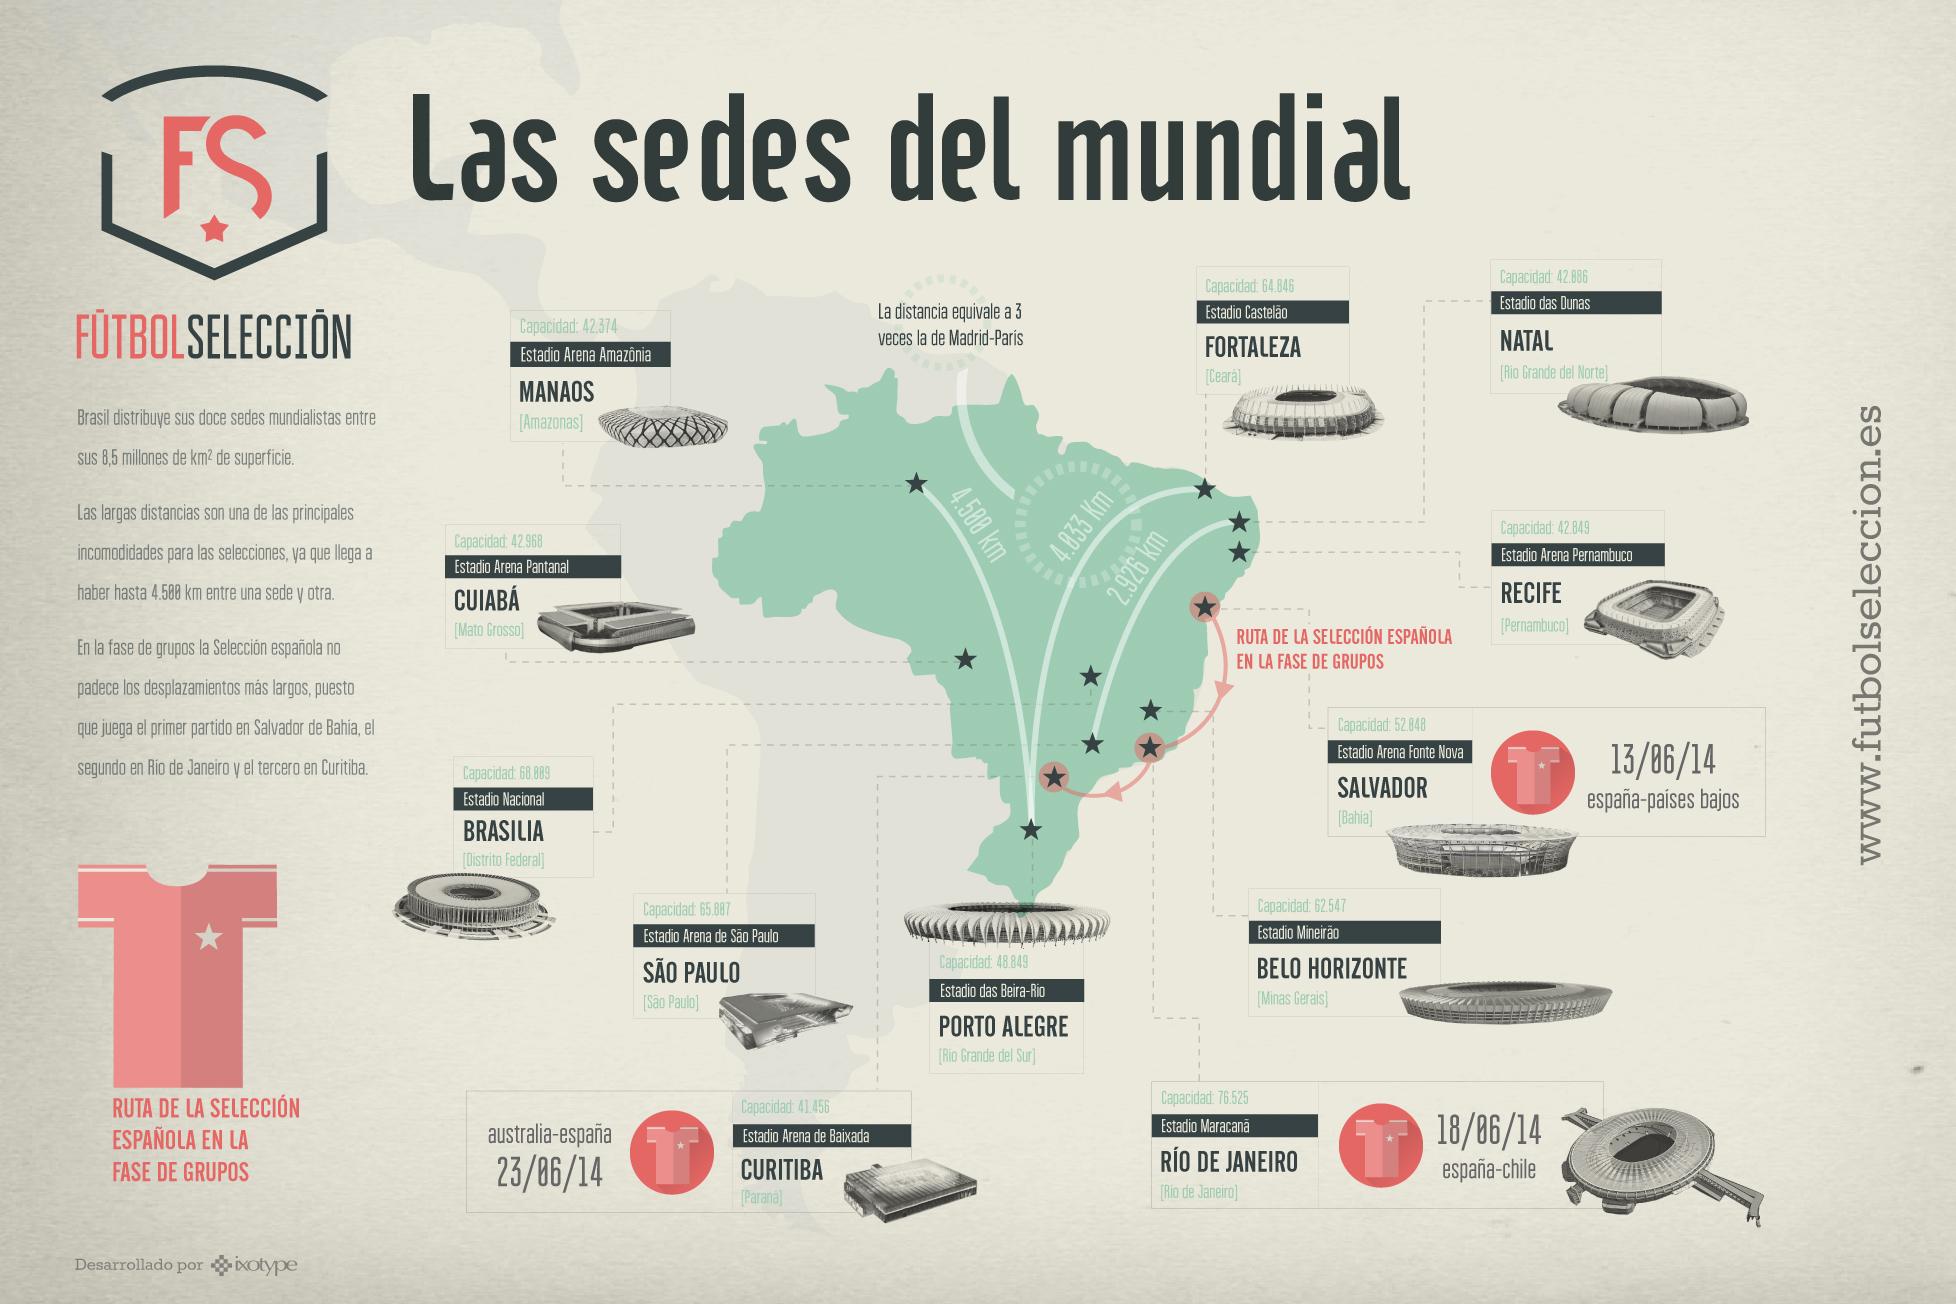 Sedes del Mundial de Brasil 2014 - FÚTBOLSELECCIÓN